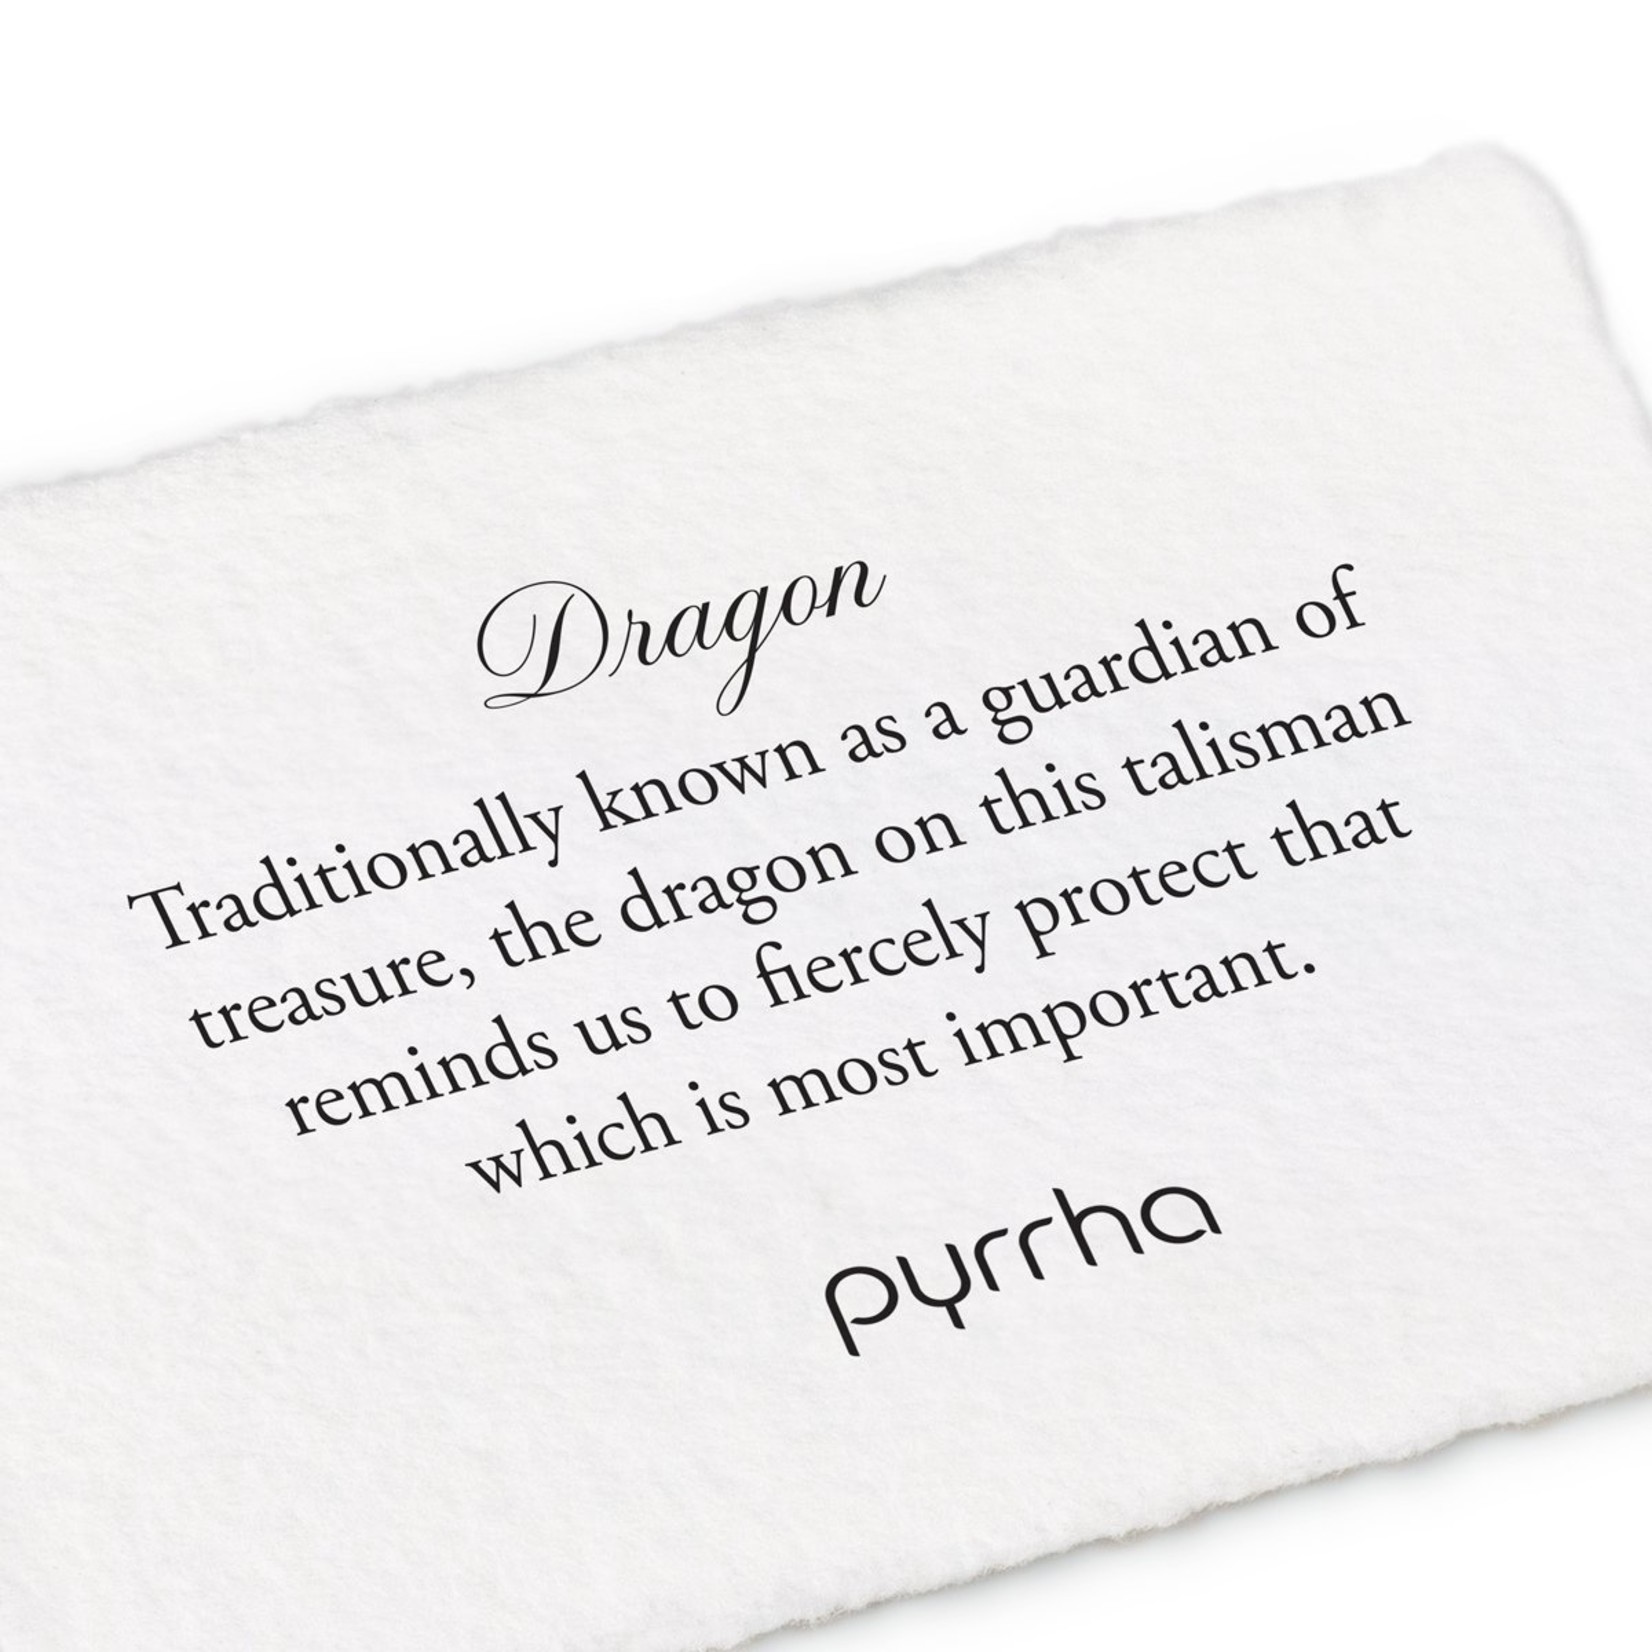 Pyrrha Dragon Signature Talisman